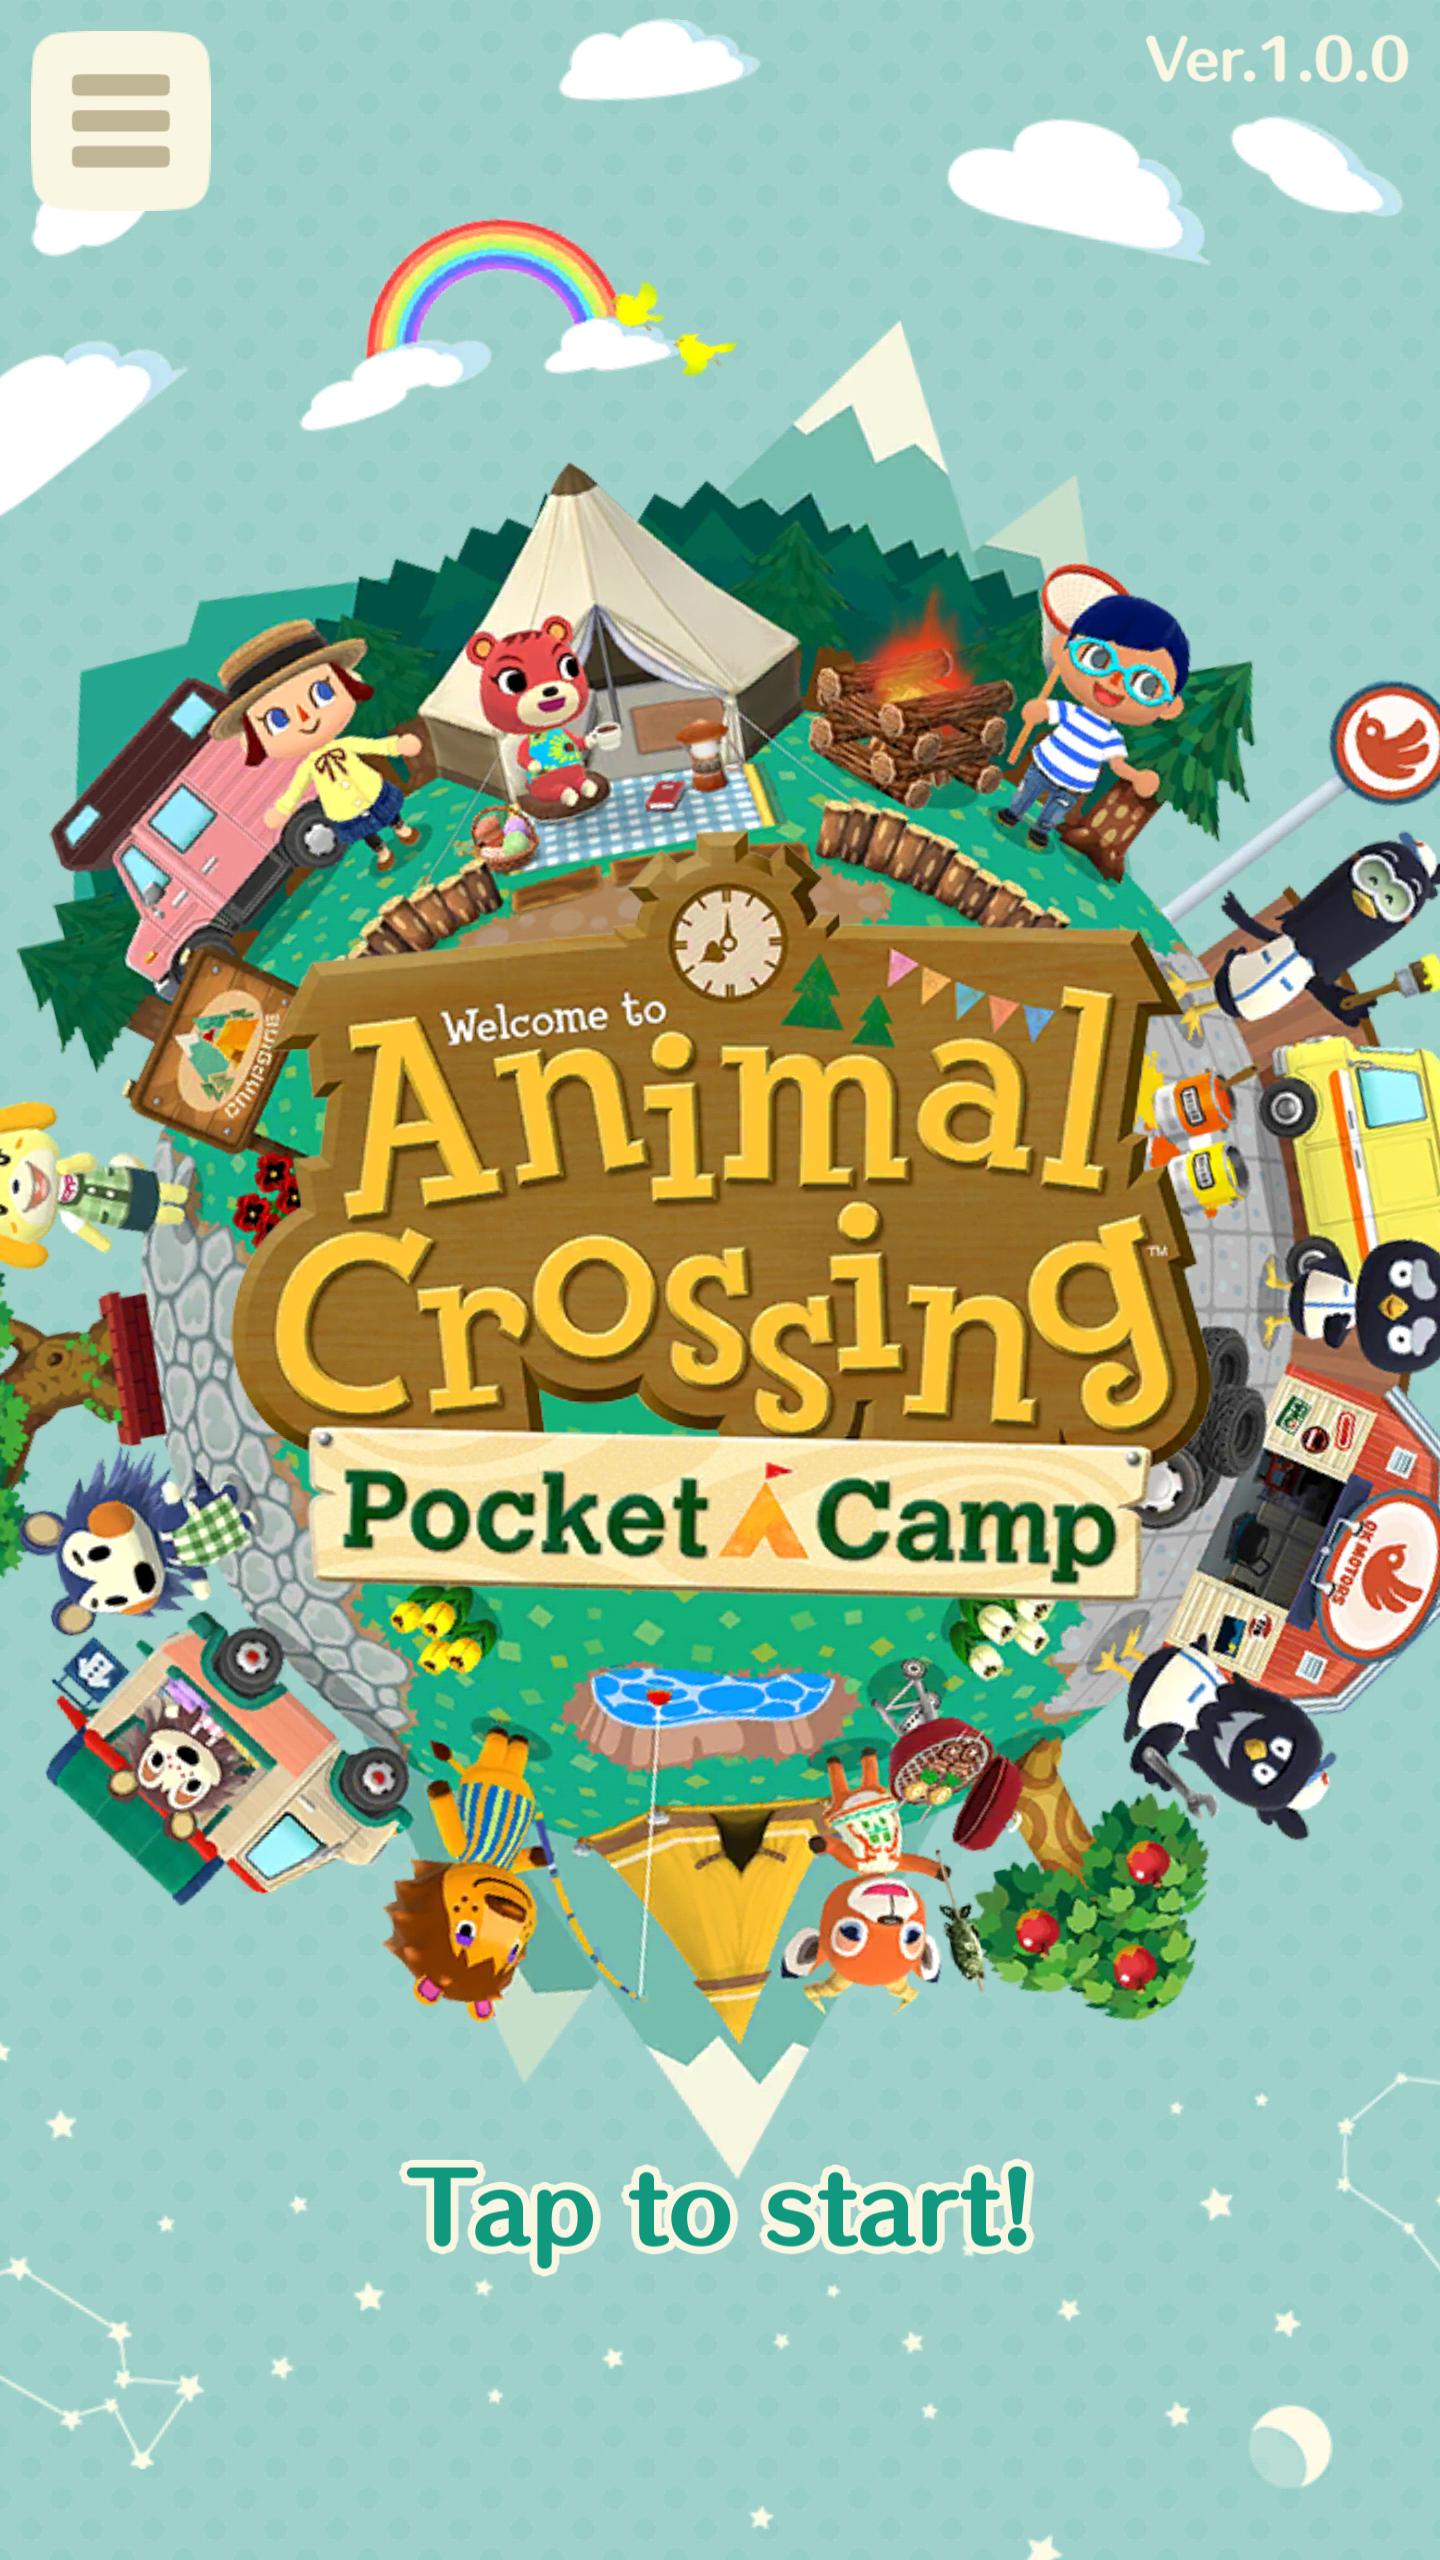 Animal Crossing Pocket Camp is Animal Crossing